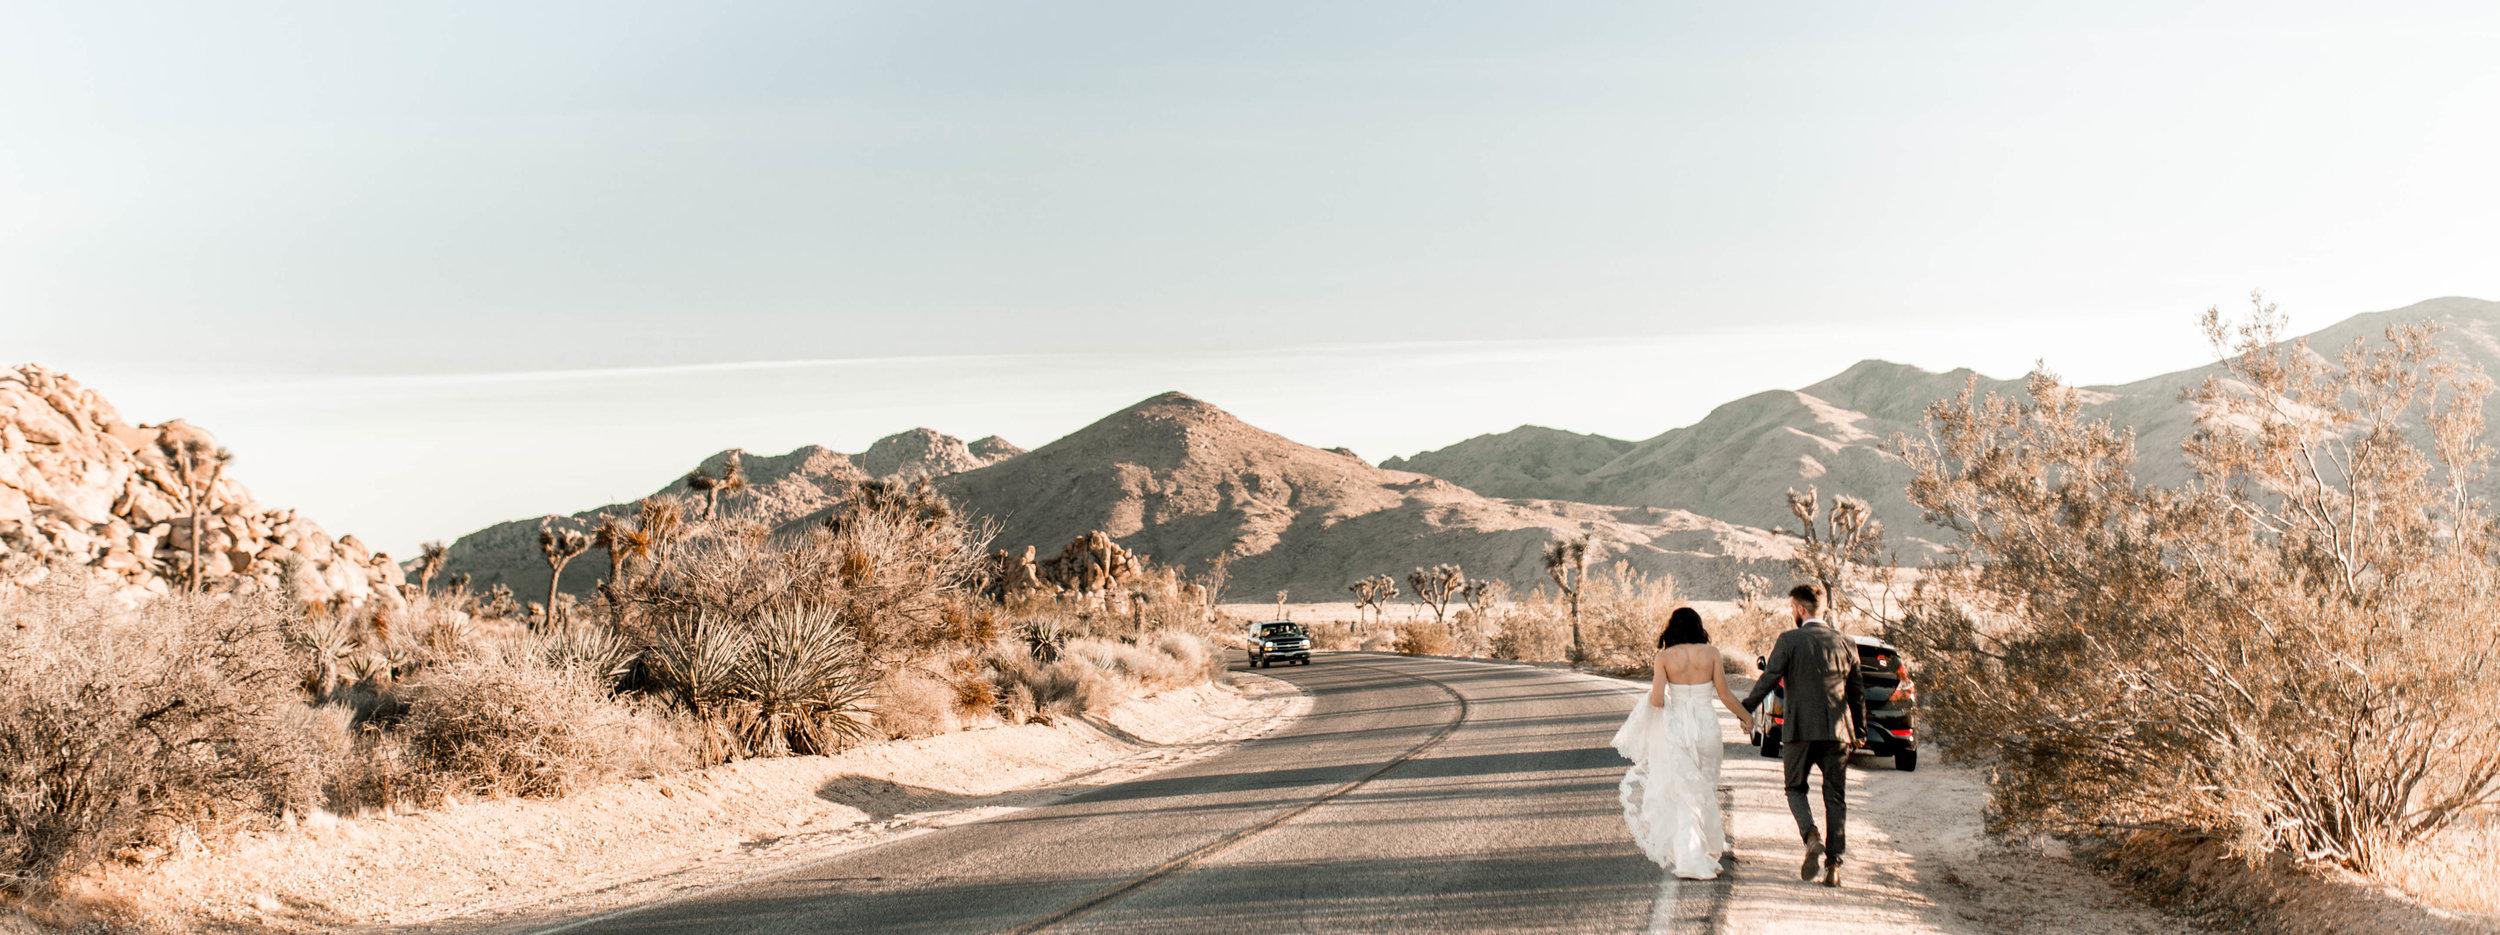 nicole-daacke-photography-joshua-tree-adventurous-elopement-wedding-national-park-wedding-photographer-adventure-wedding-adventurous-elopement-jtree-joshua-tree-national-park-wedding-photographer-intimate-weddings-golden-desert-love-19.jpg